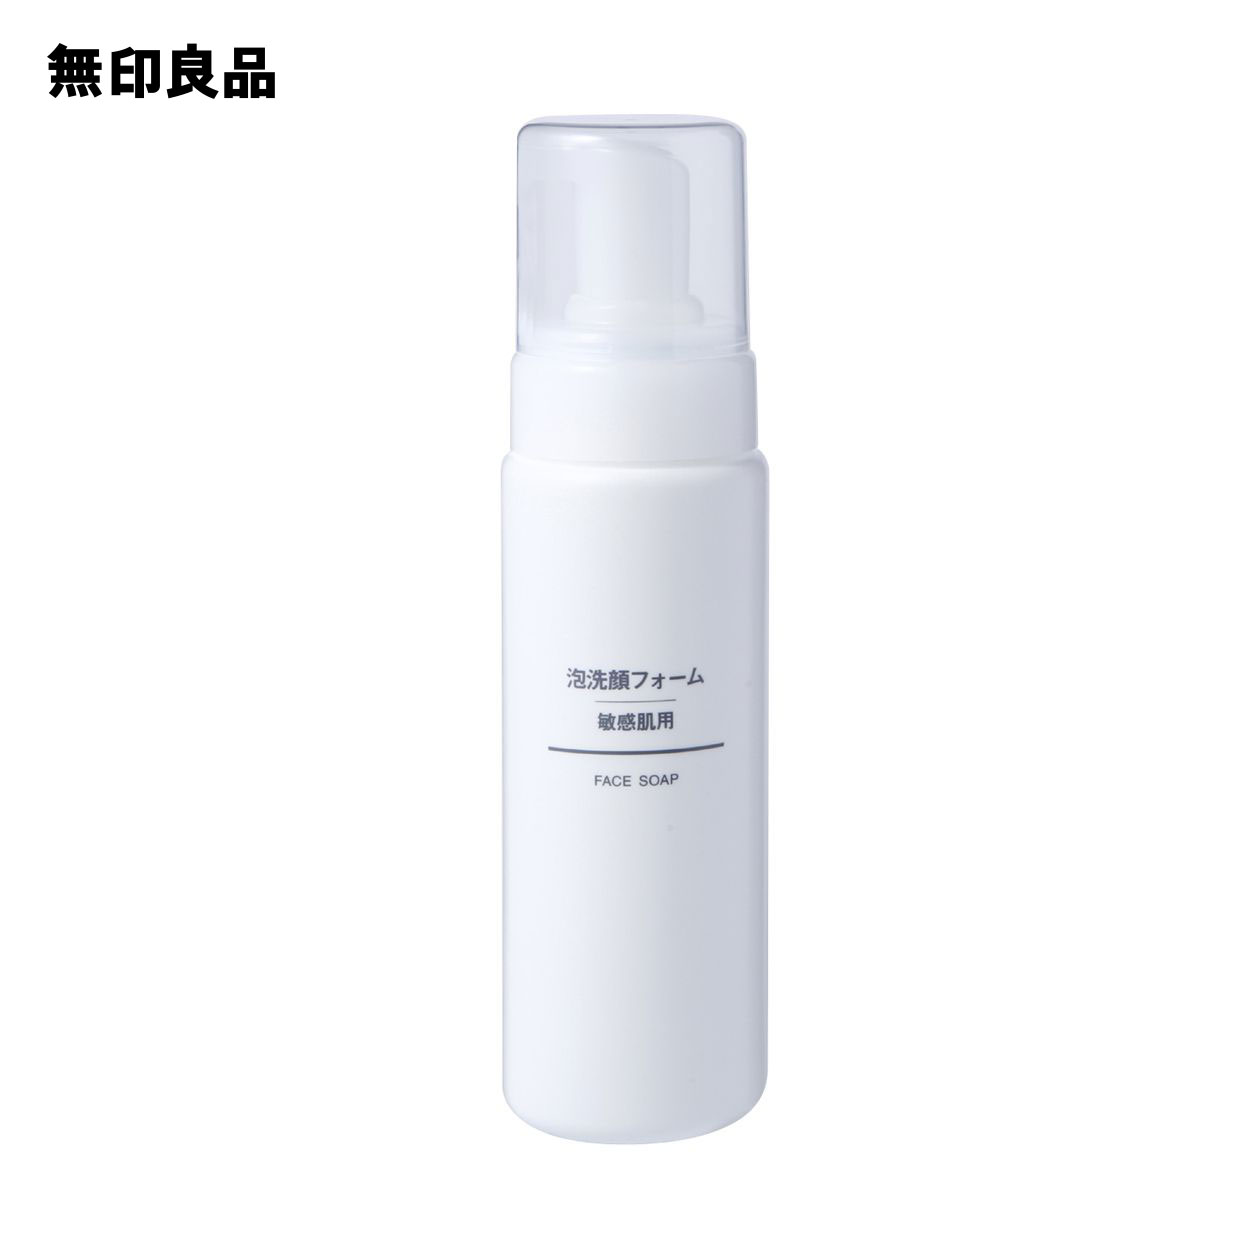 無印良品 公式 信用 信用 敏感肌用200ml 泡洗顔フォーム